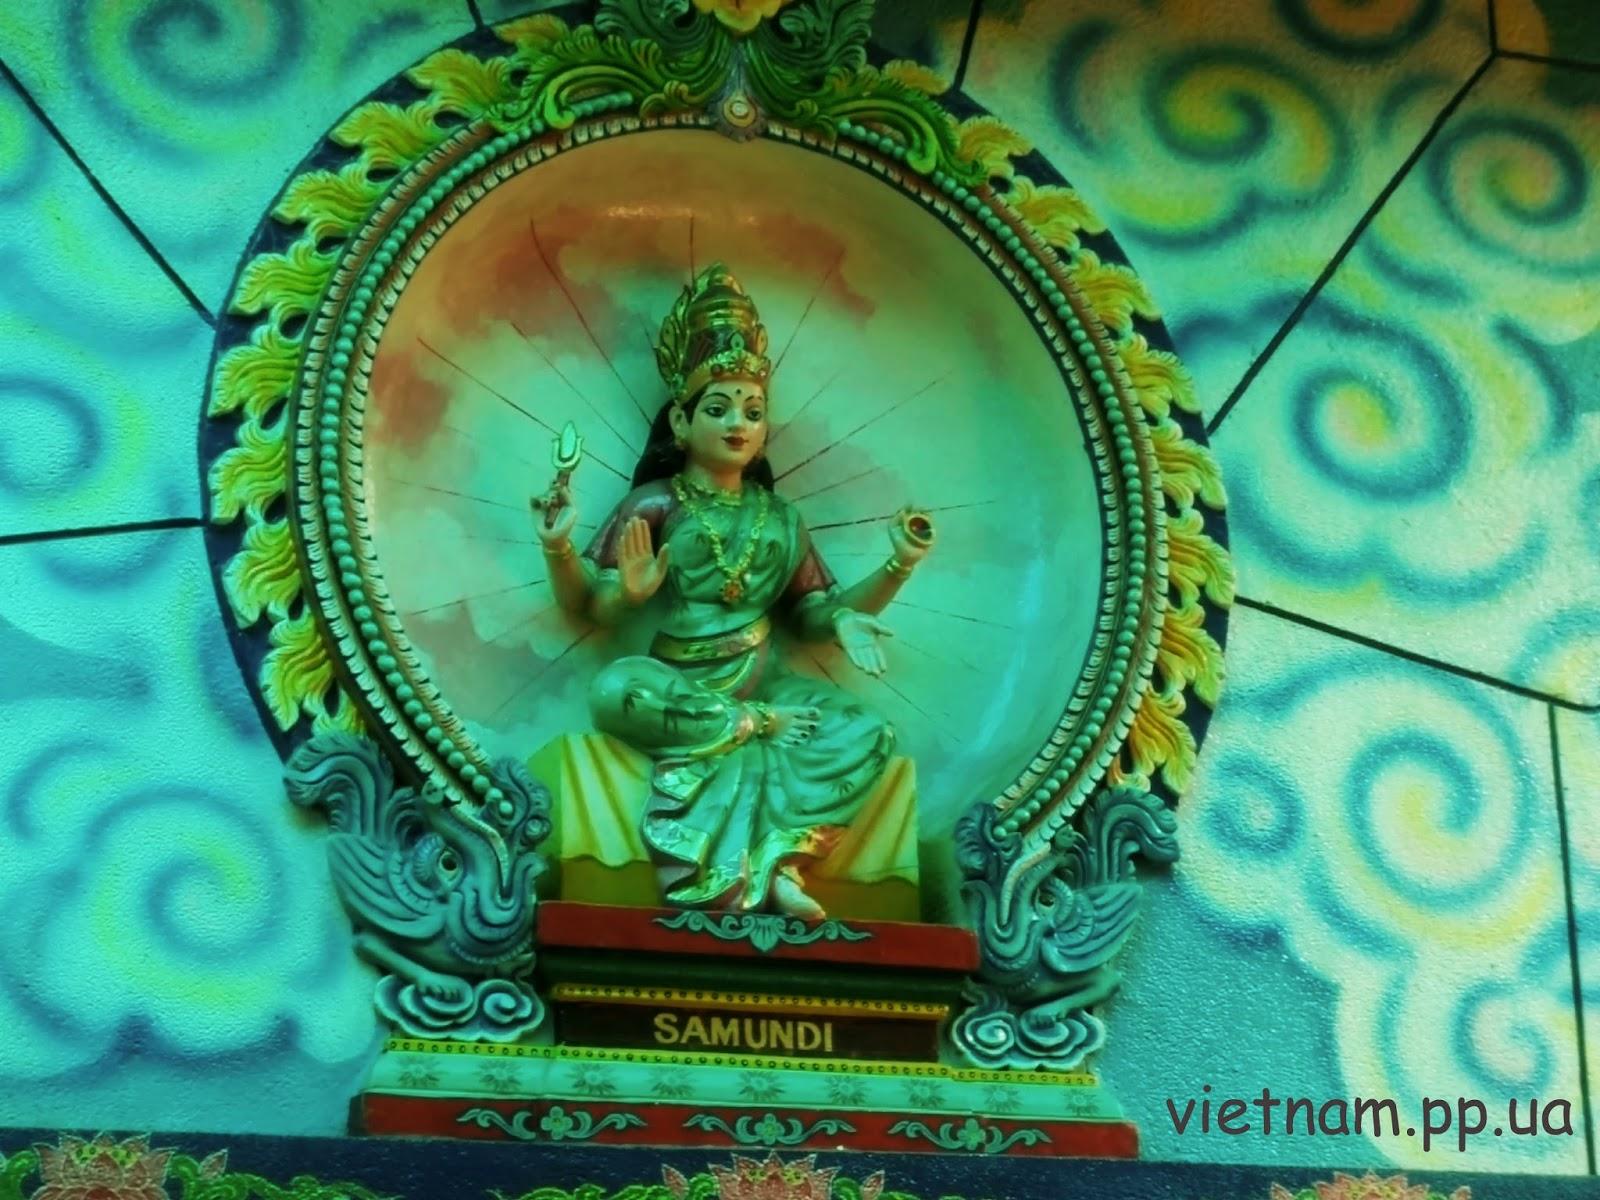 Божество хинди:Samundi